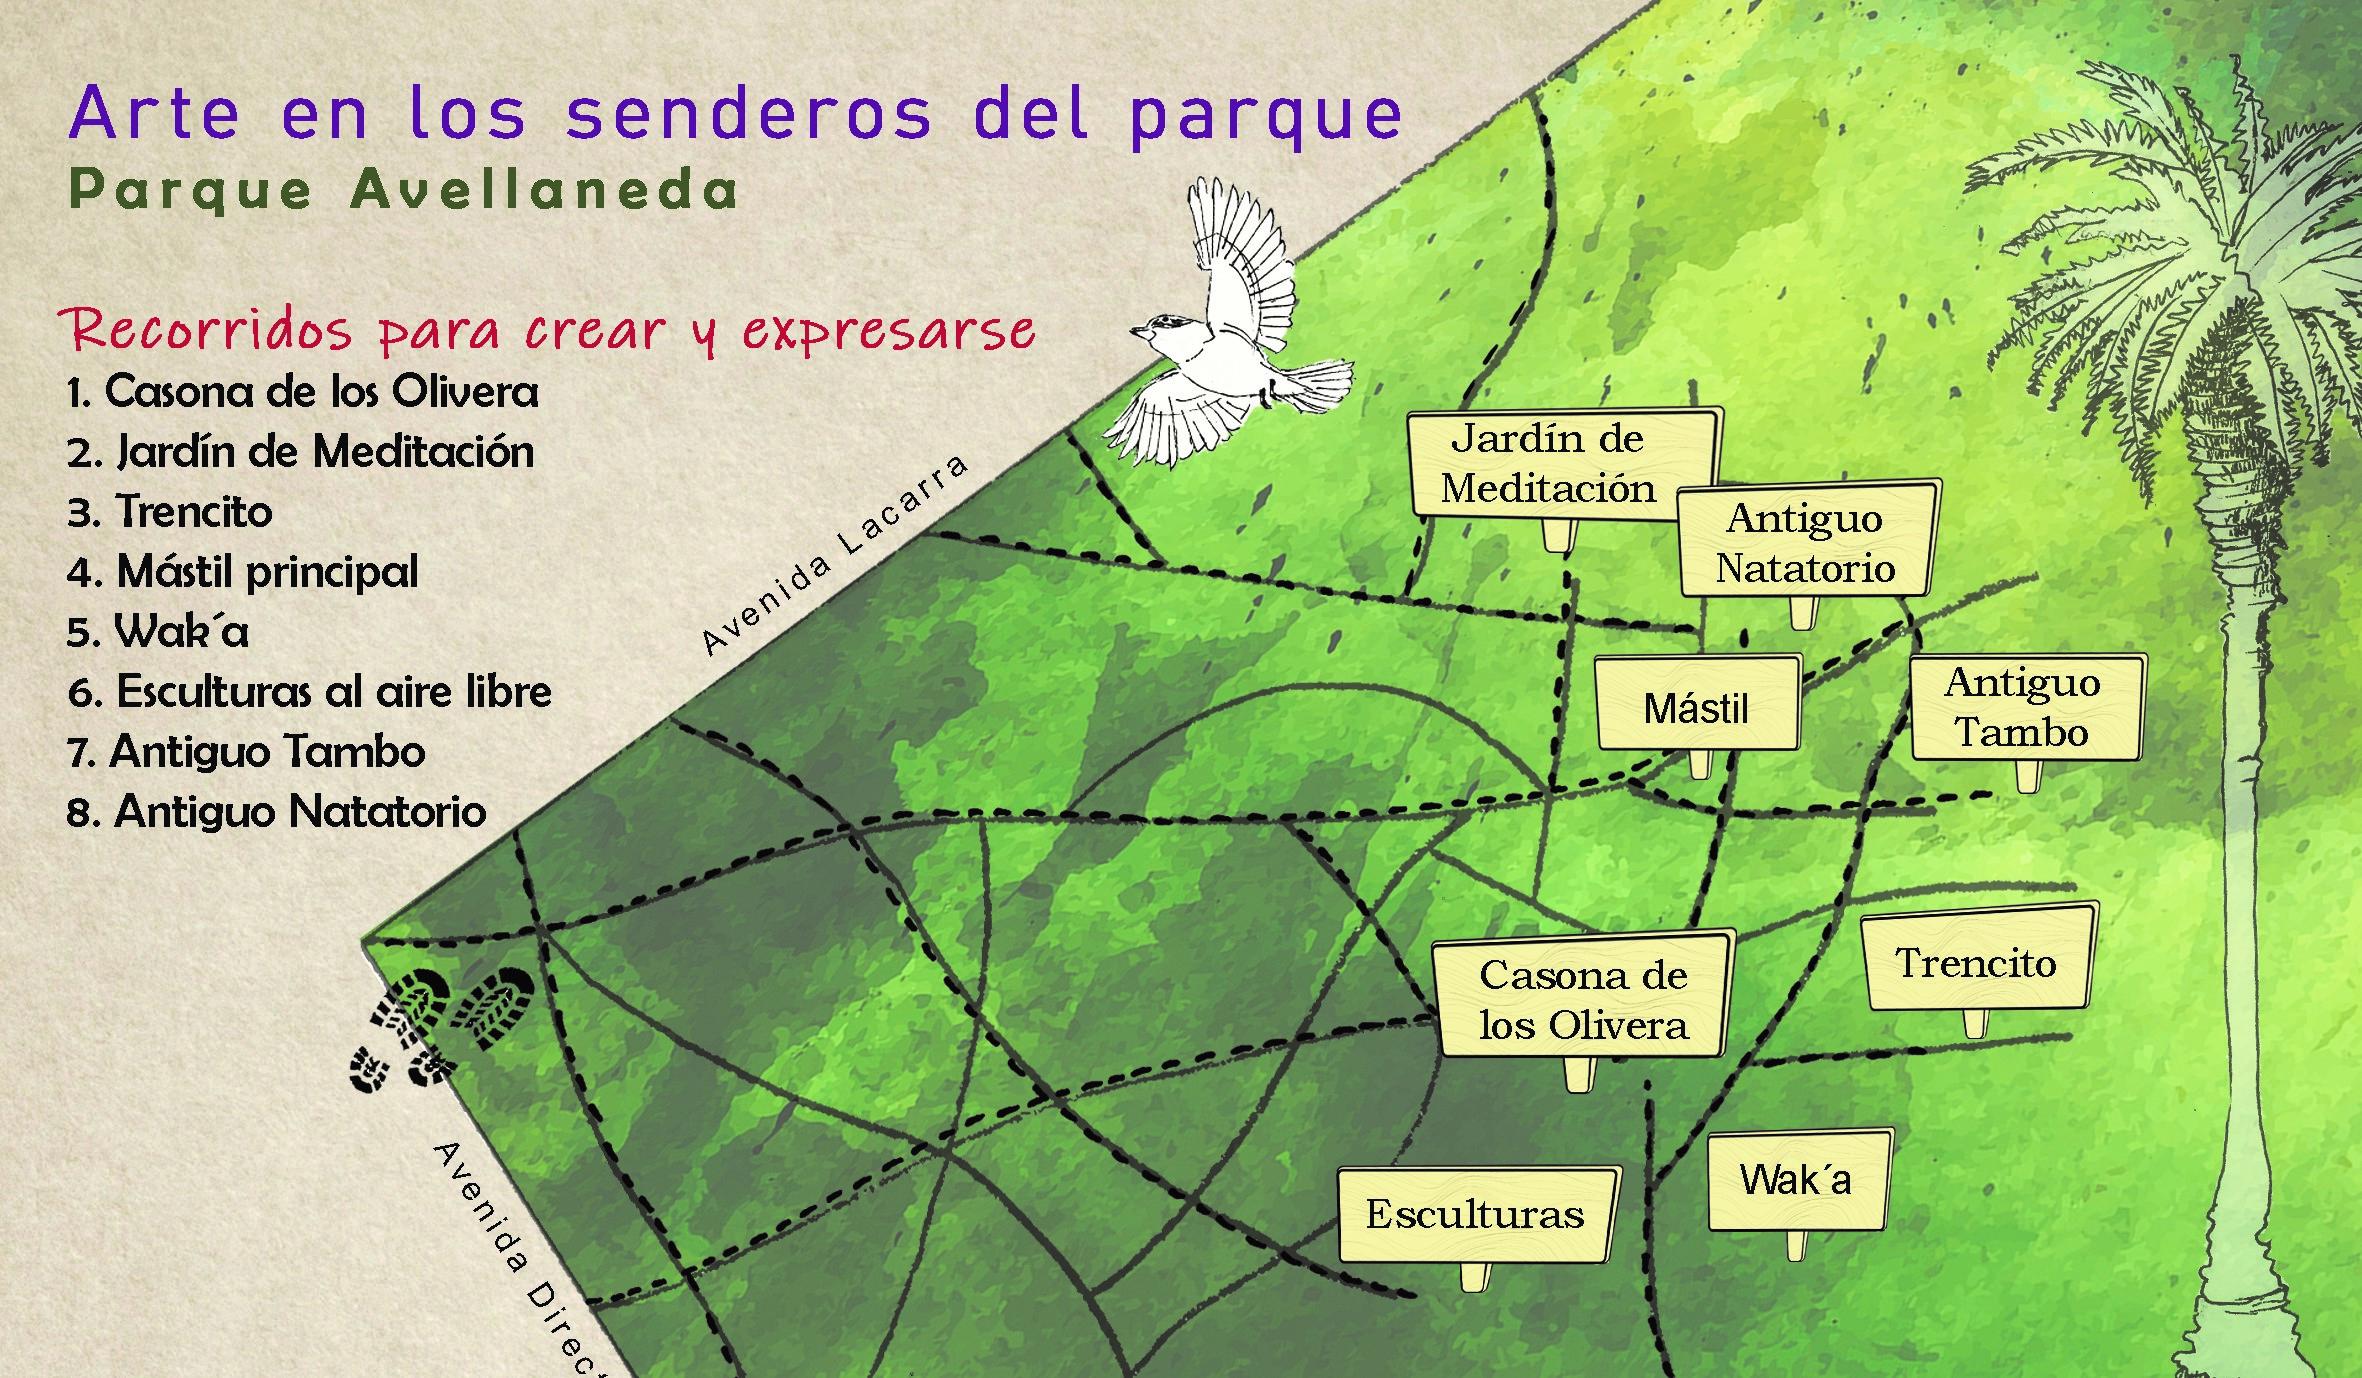 C:\Users\Liliana\Desktop\Página Liliana\Agenda\Sin subir\Mapa Senderos.jpg